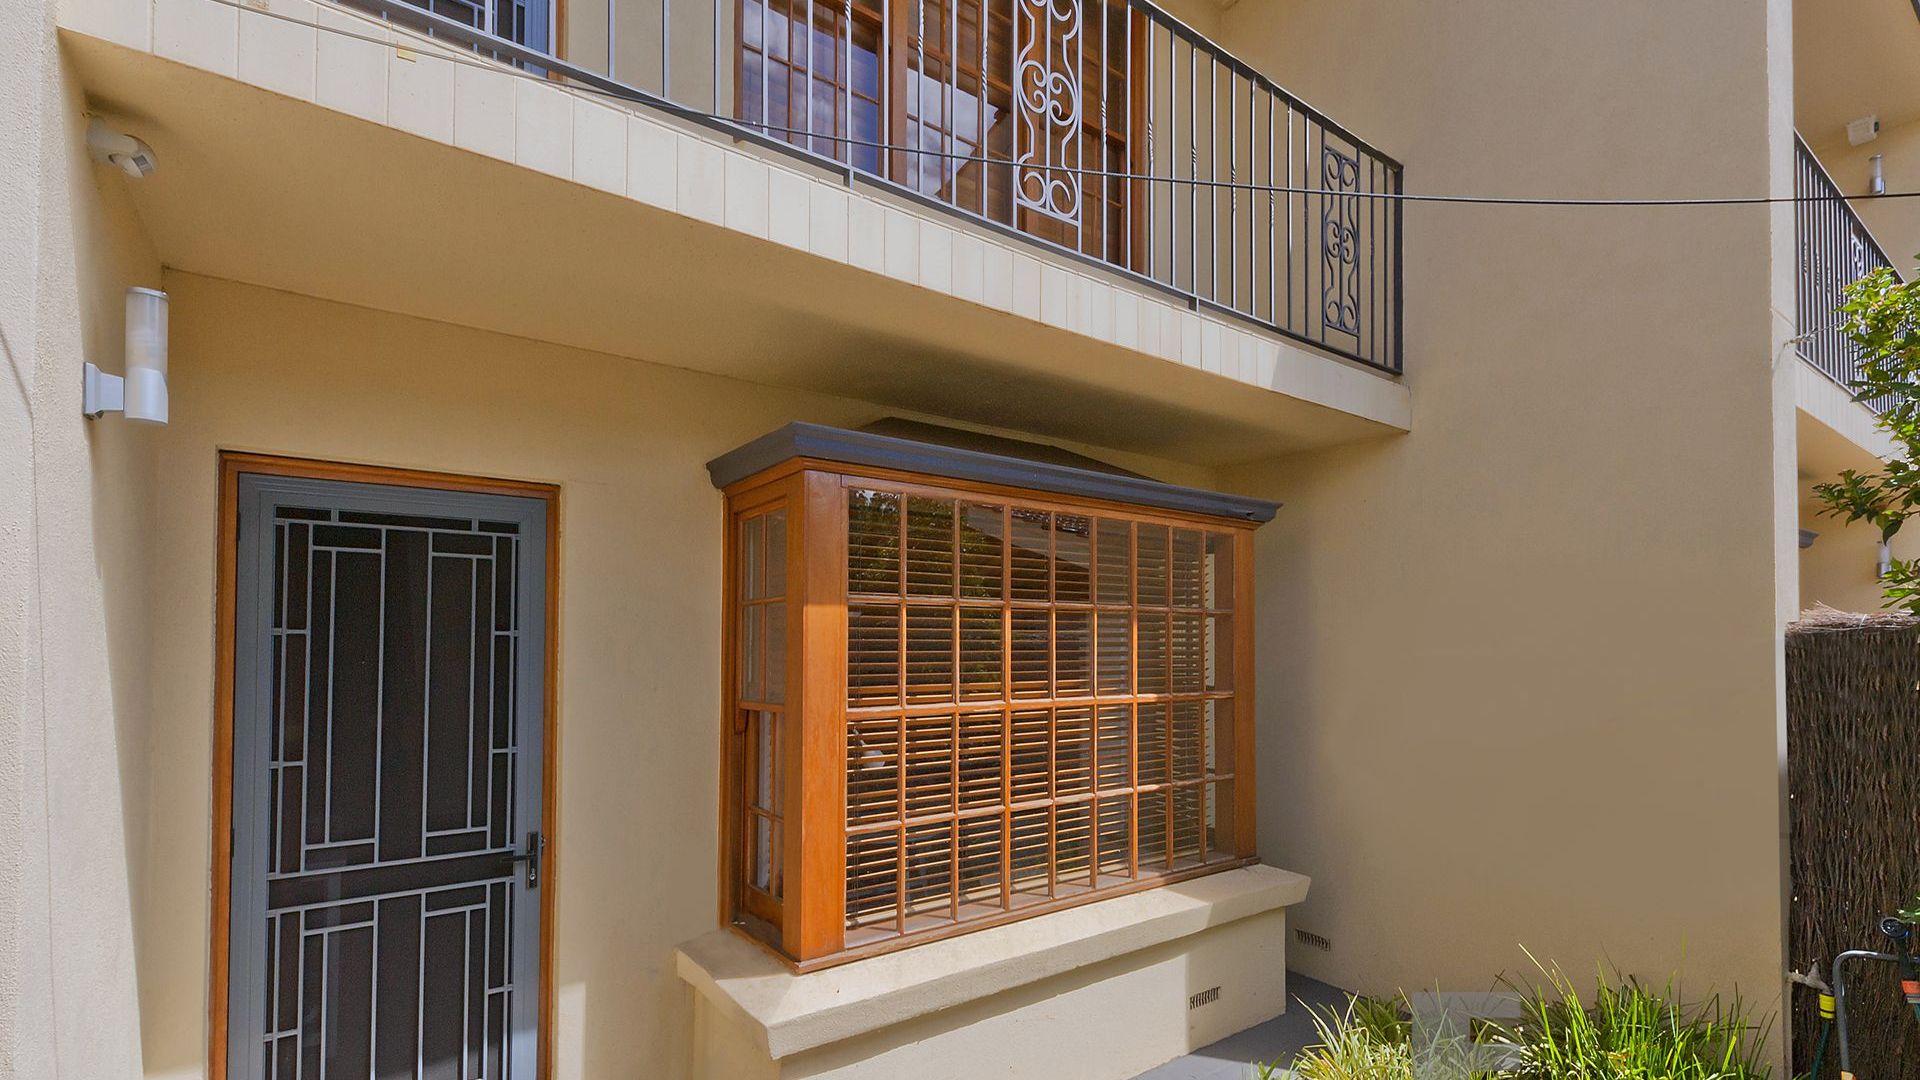 Unit 7, 30 Lefevre Terrace, North Adelaide SA 5006, Image 2